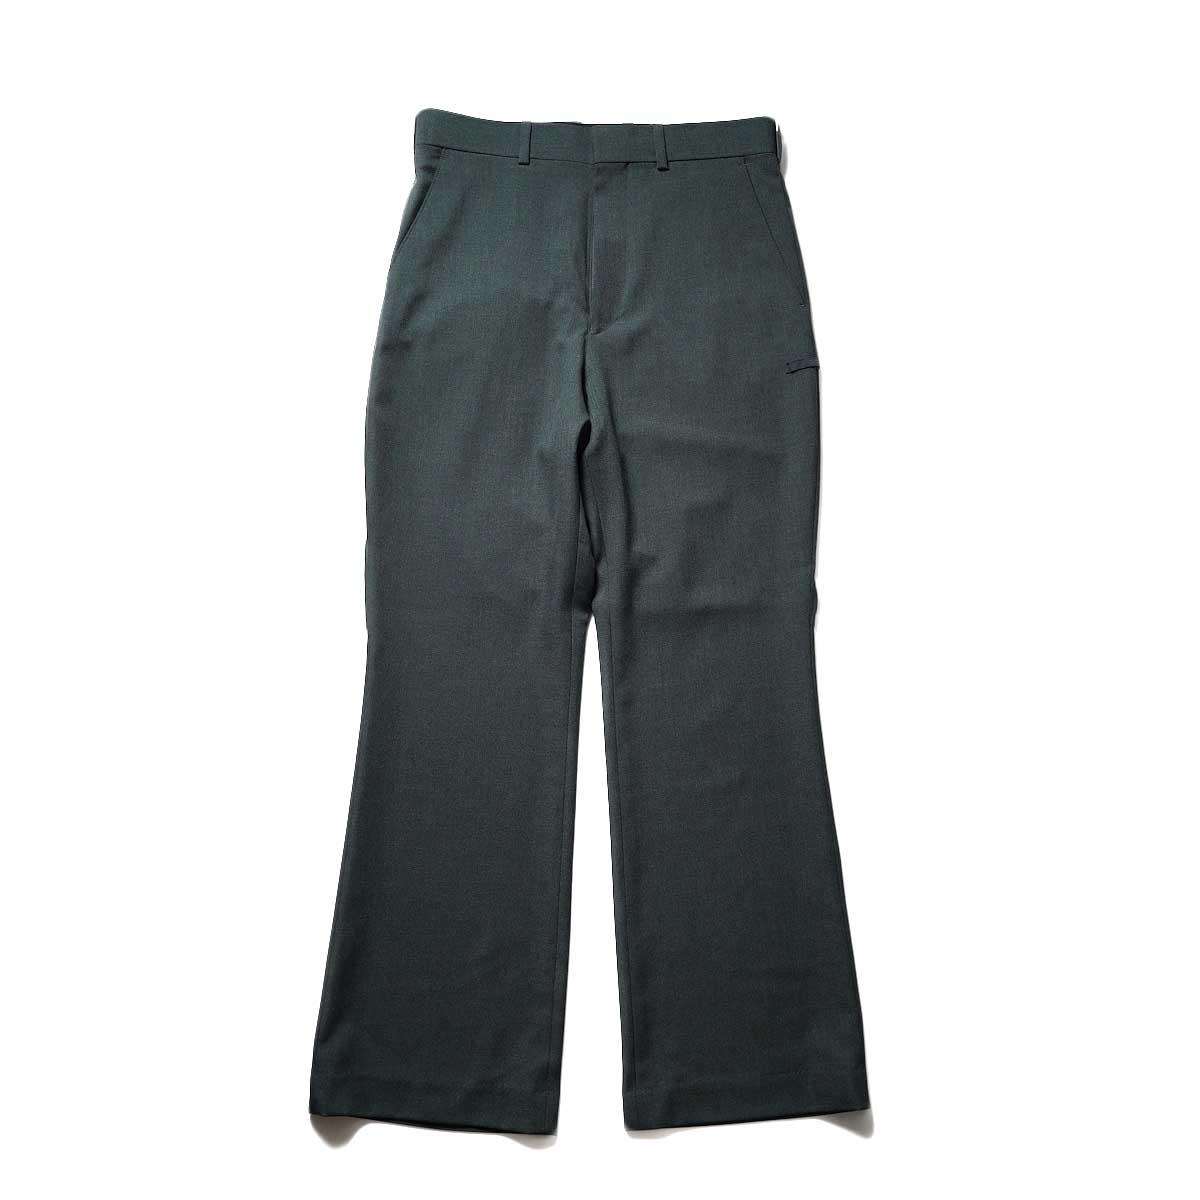 N.HOOLYWOOD / 2212-PT21-008 Flair Slacks (Charcoal)